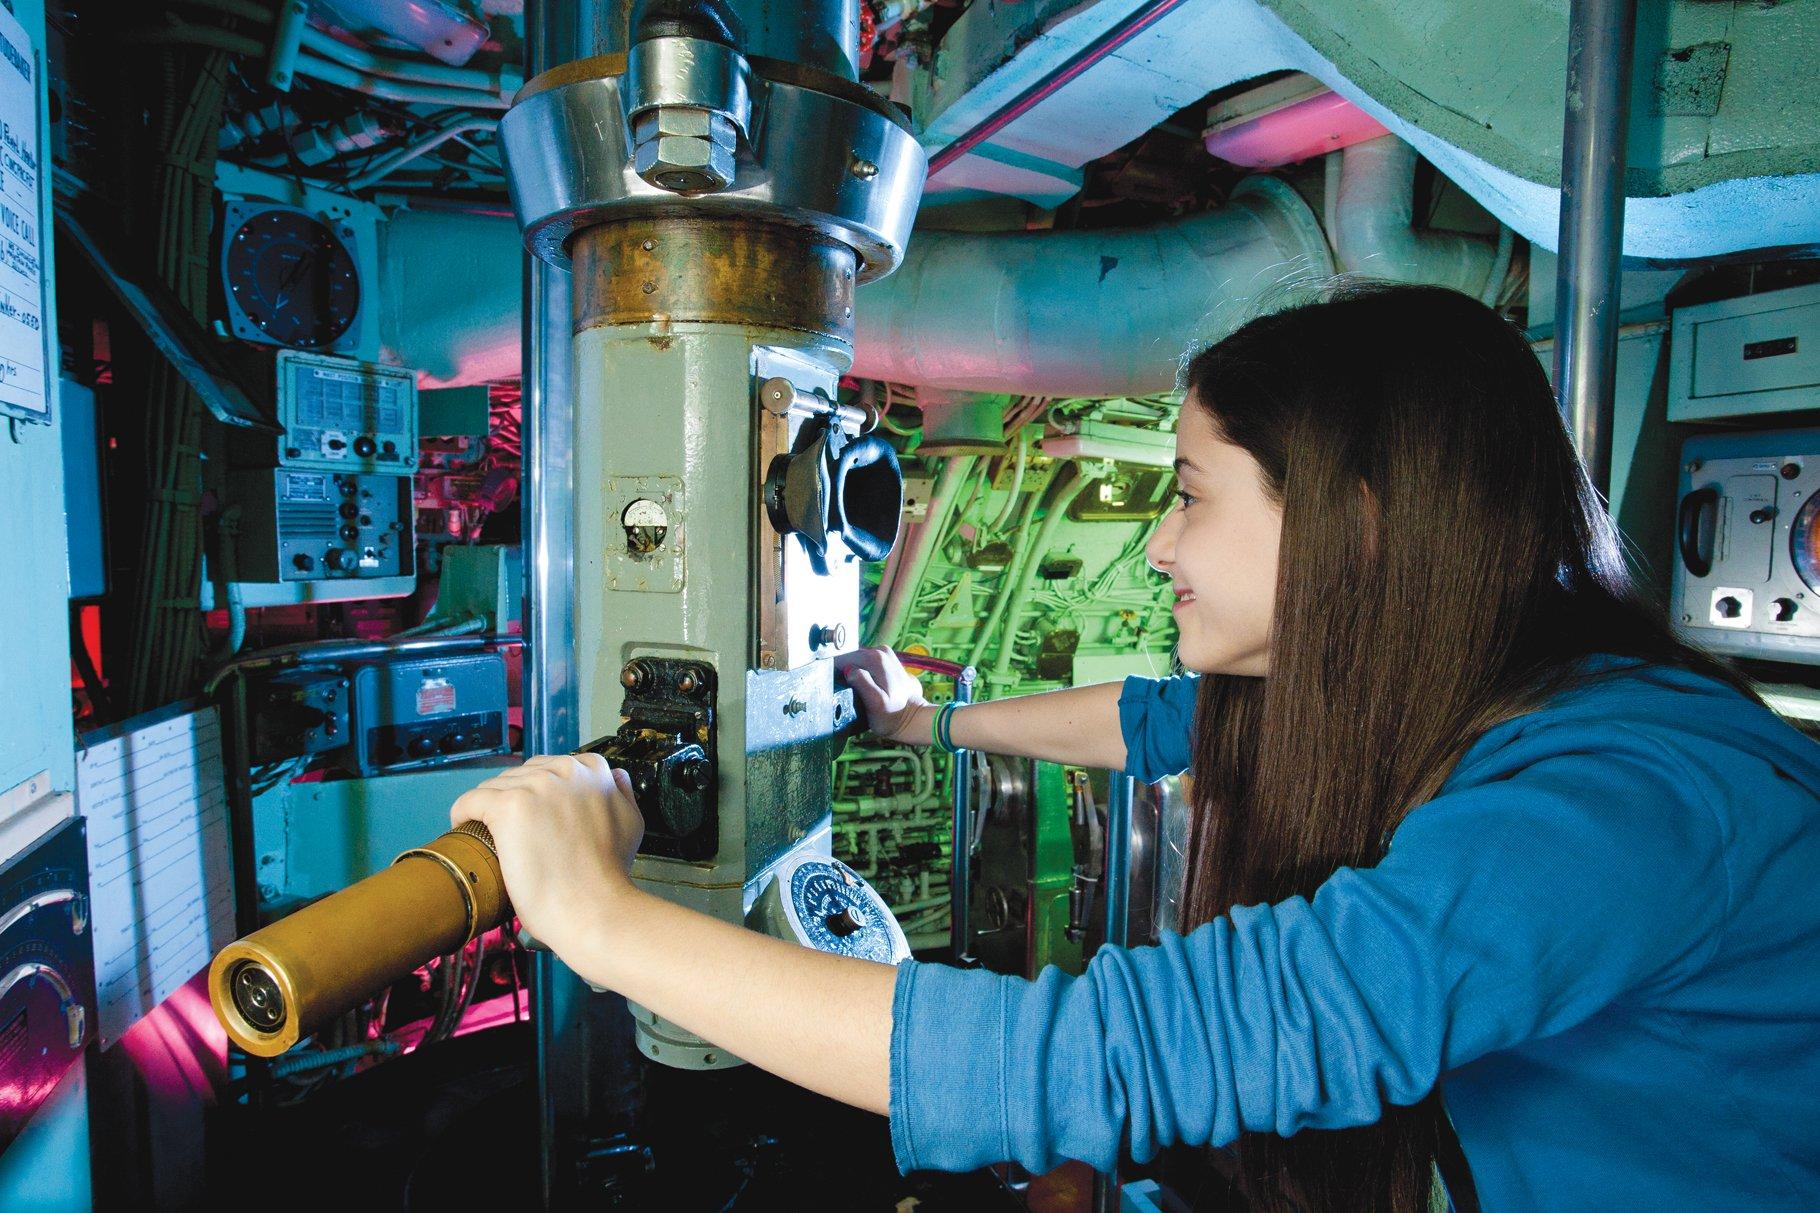 Student at Intrepid Sea, Air & Space Museum